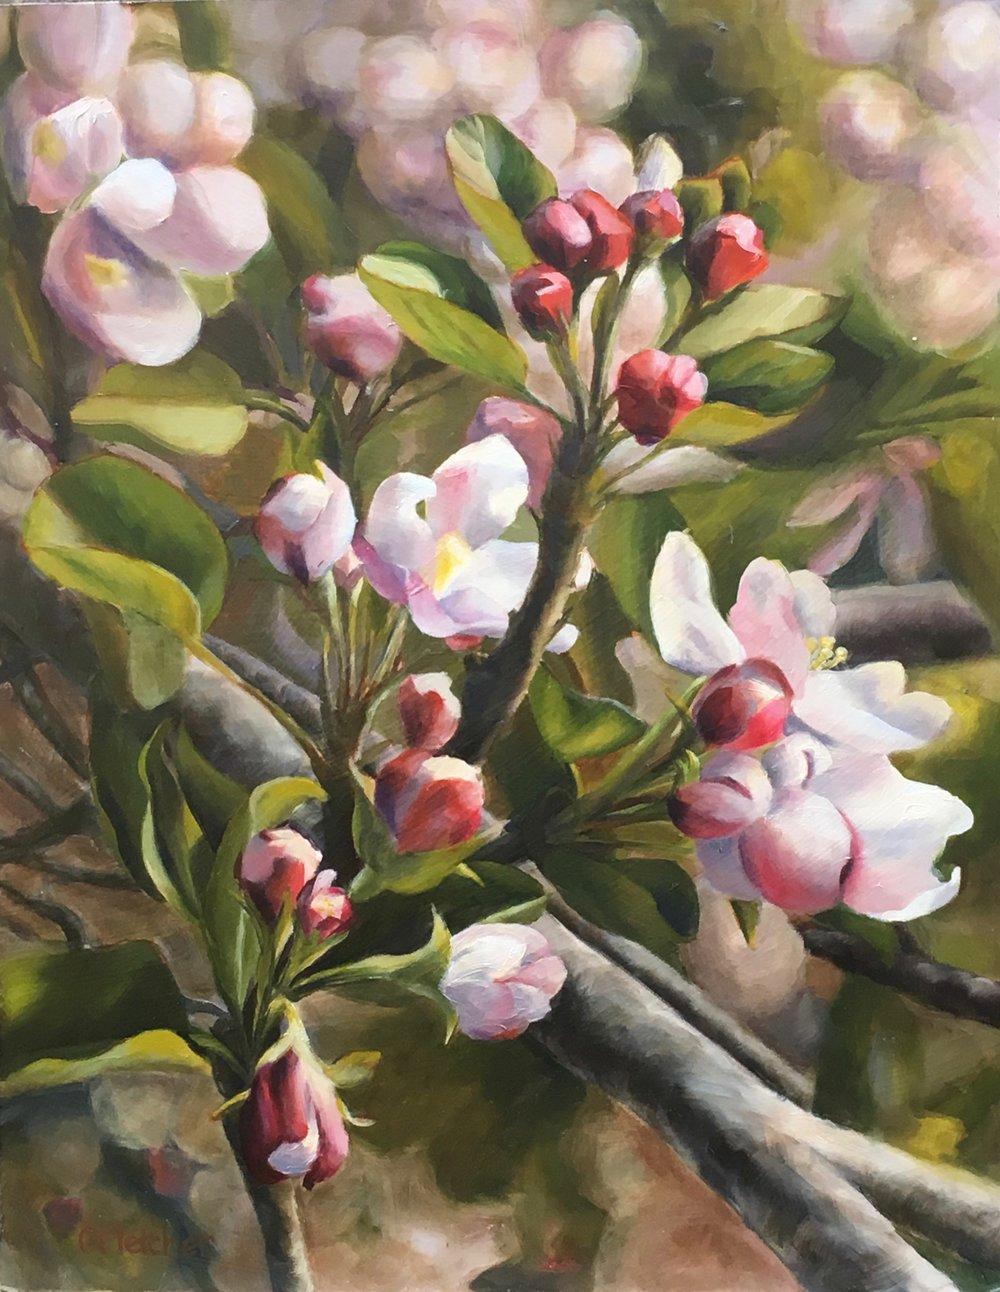 Spring in Julian  - 11x14 - Oil on panel